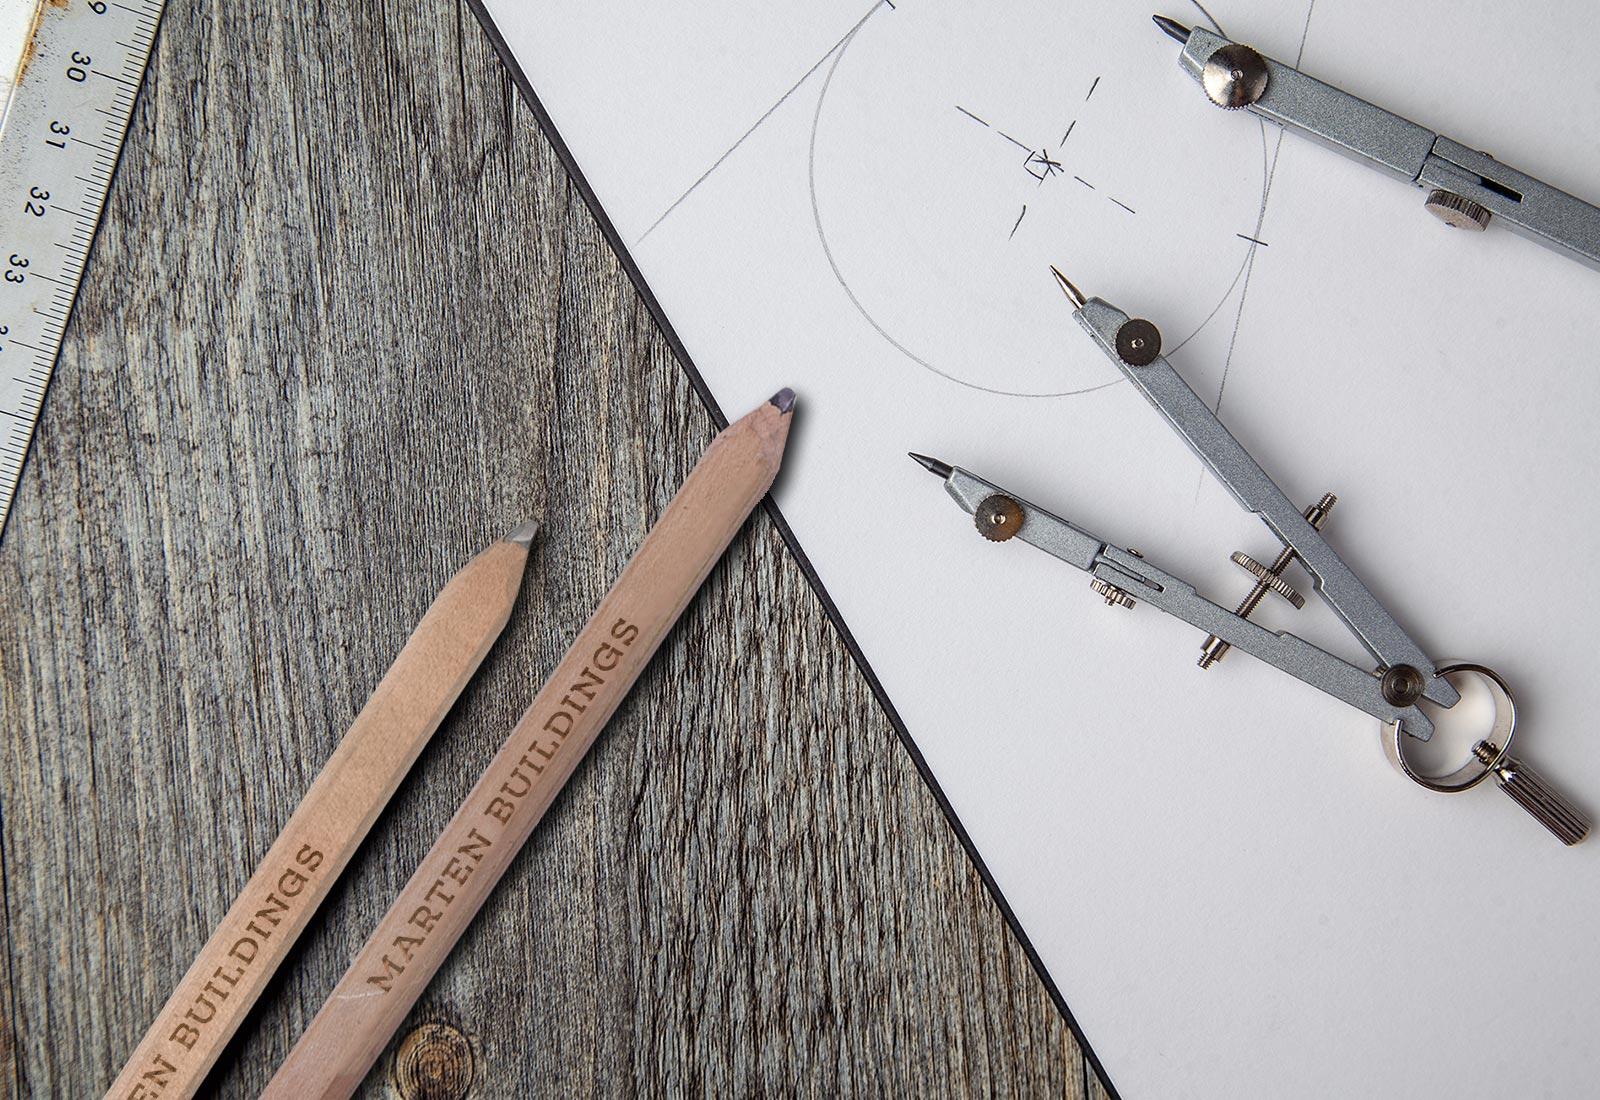 Marten Portable Buildings Carpenters Pencil and Drafting Tools